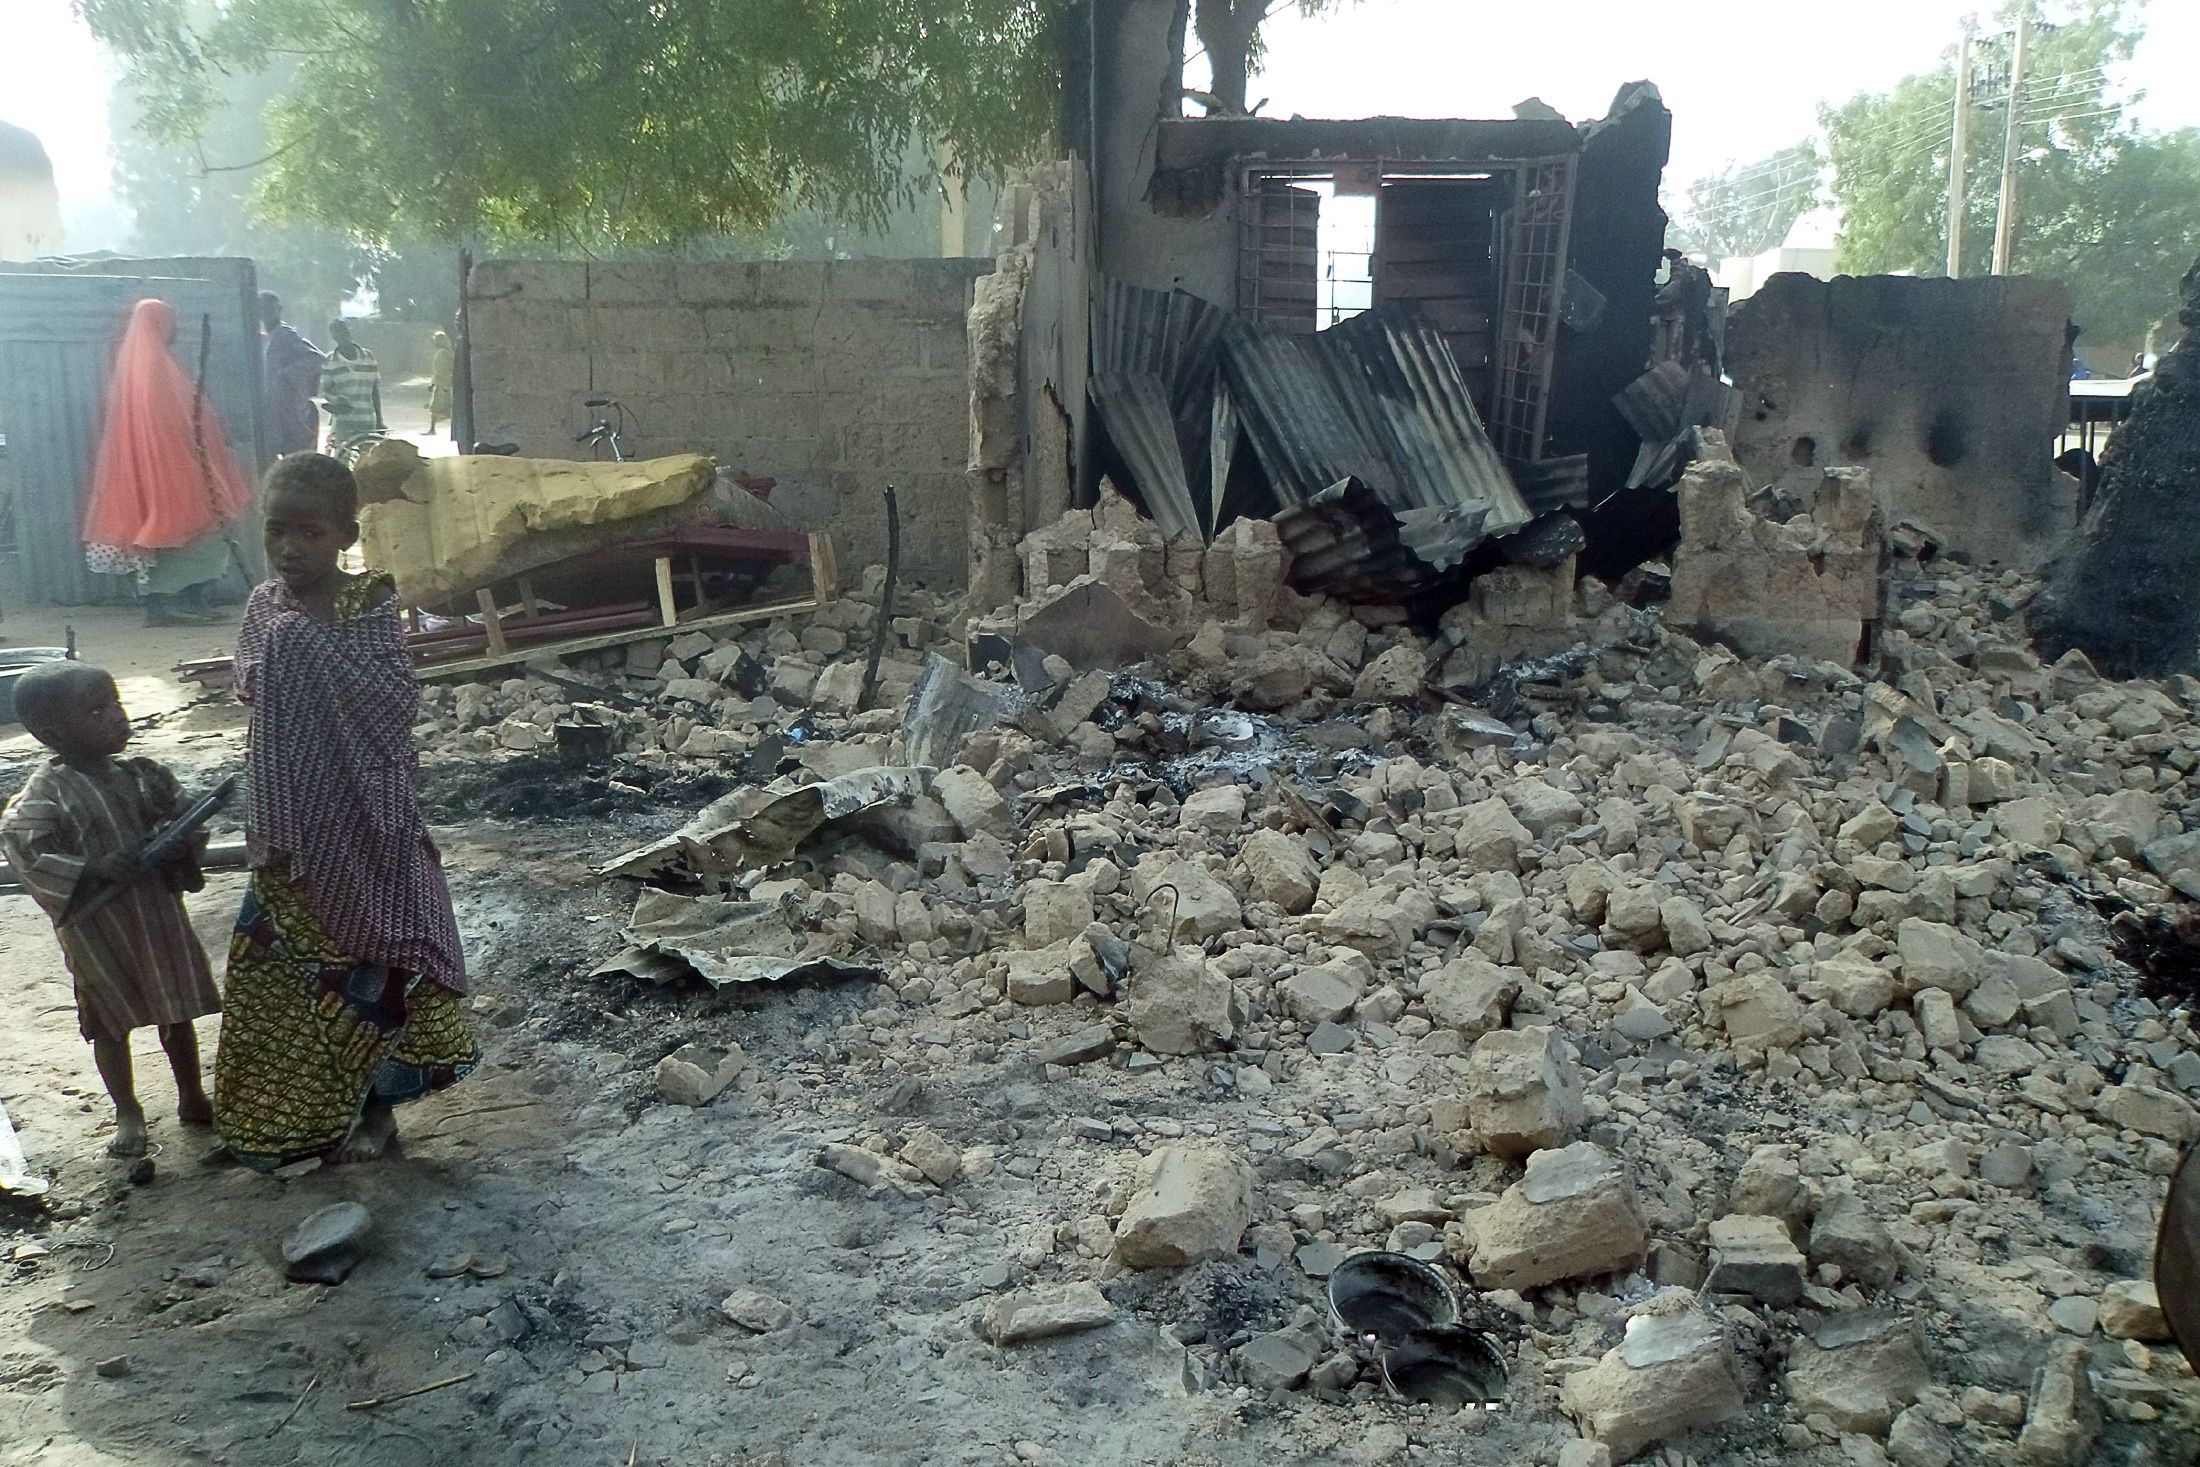 Boko Haram Threatens Us Children Stand Near Rubble After Boko Haram Attacks